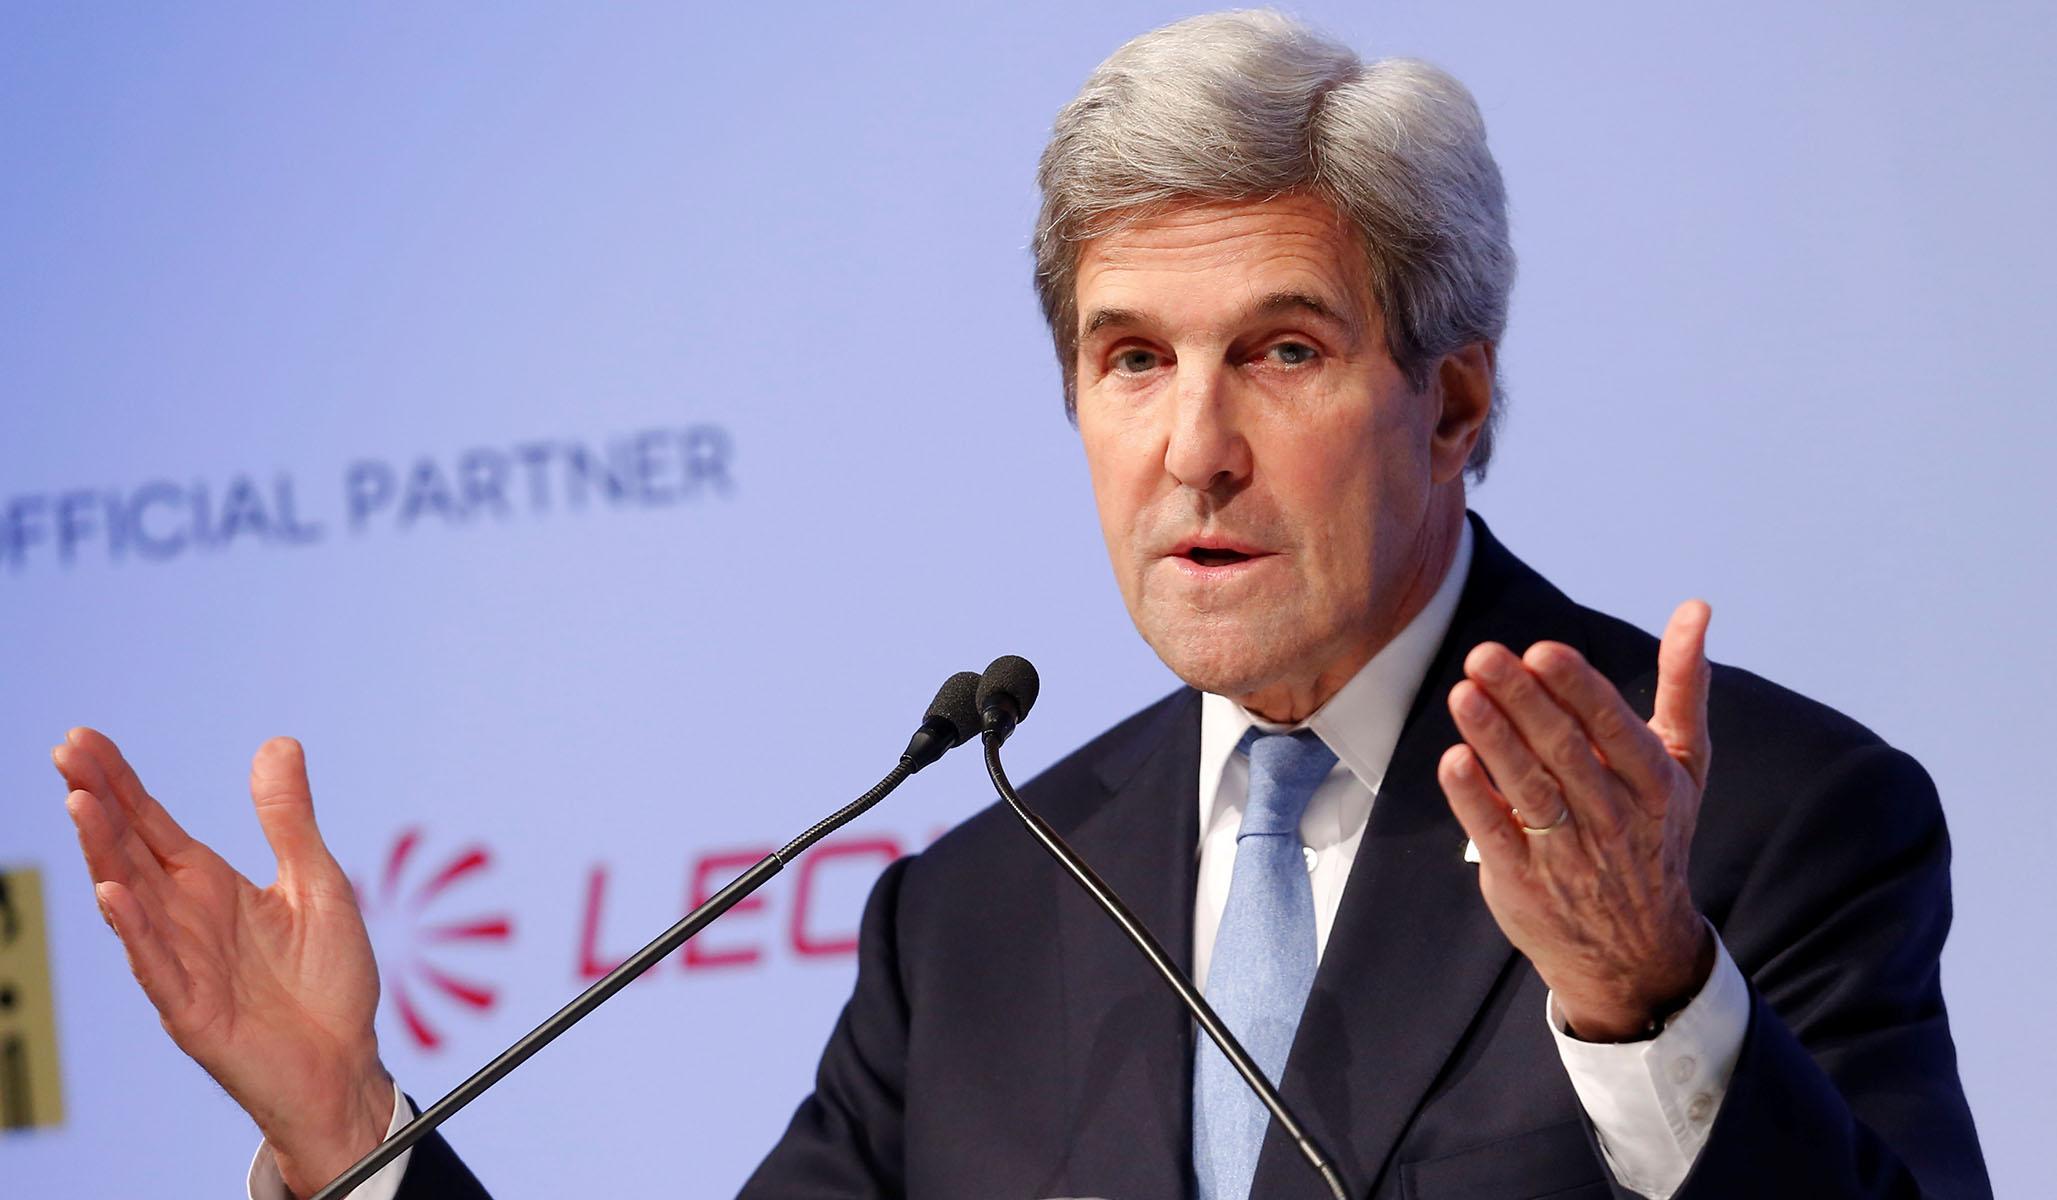 John Kerry Endorses Joe Biden for President to Fix 'the World that Donald Trump has Smashed Apart'